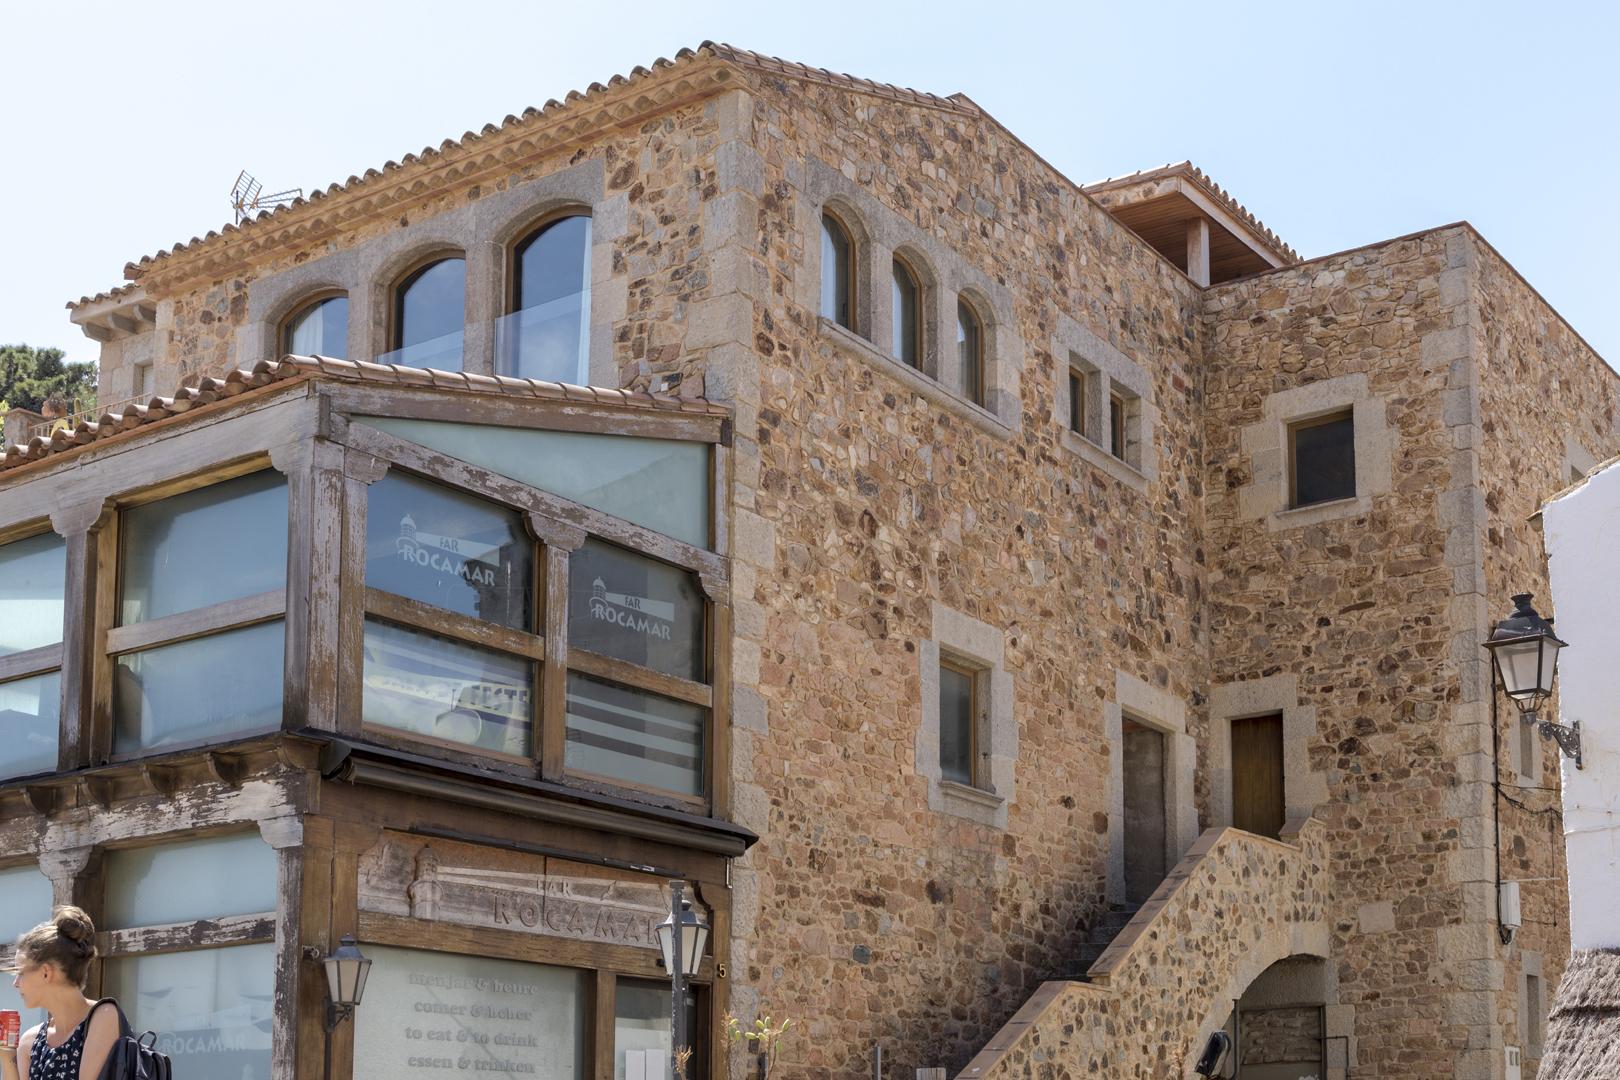 Rocamar apartment building